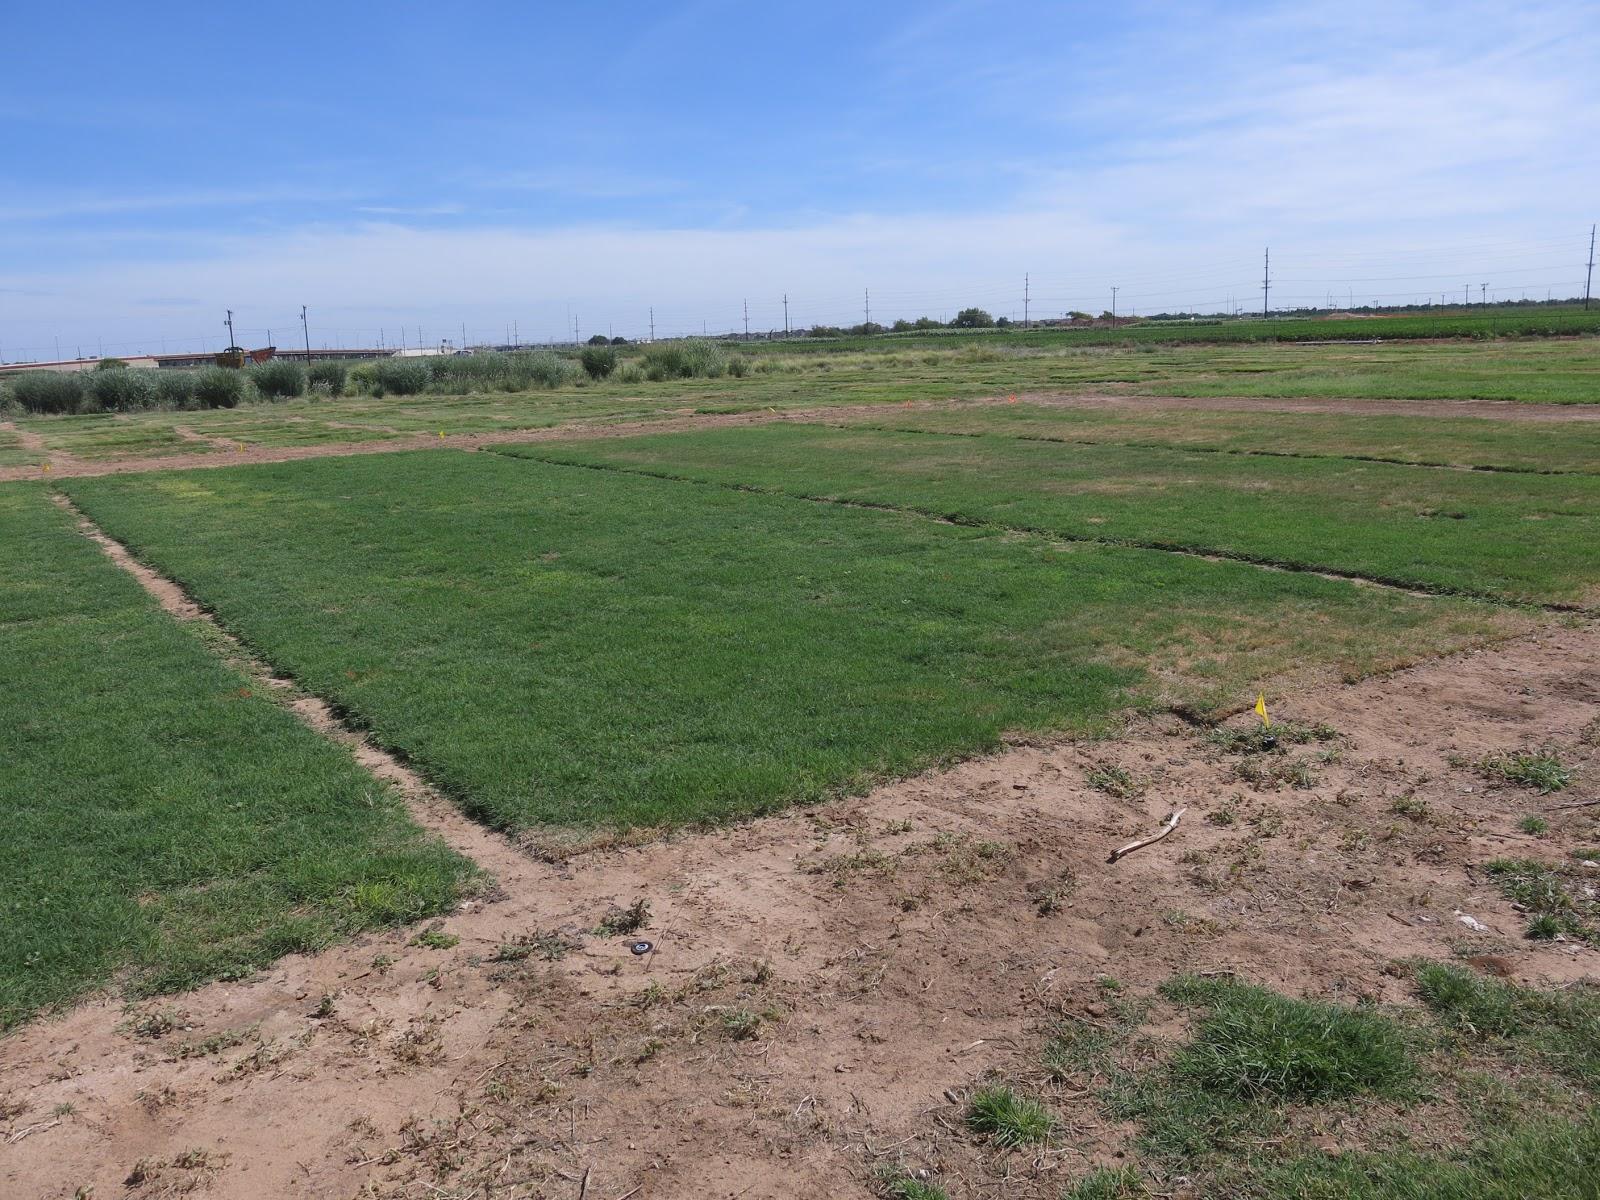 Spring Lawn Management 101: Irrigation | Texas Tech Turfgrass Science